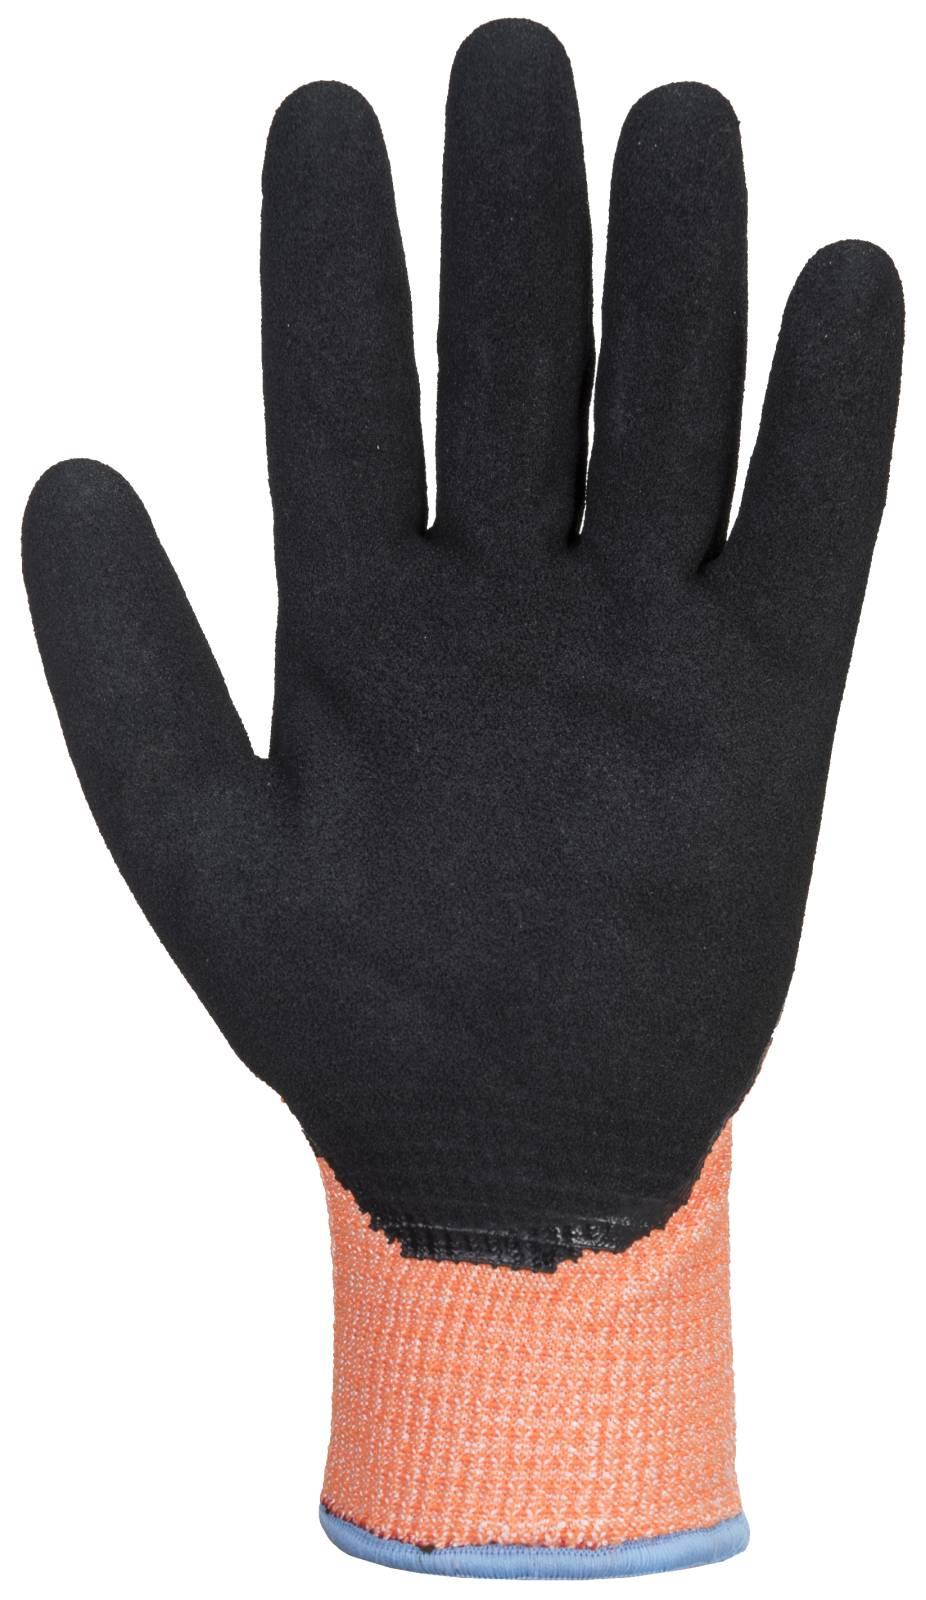 Portwest Handschoenen A646 Snijbestendig oranje-zwart(O8)